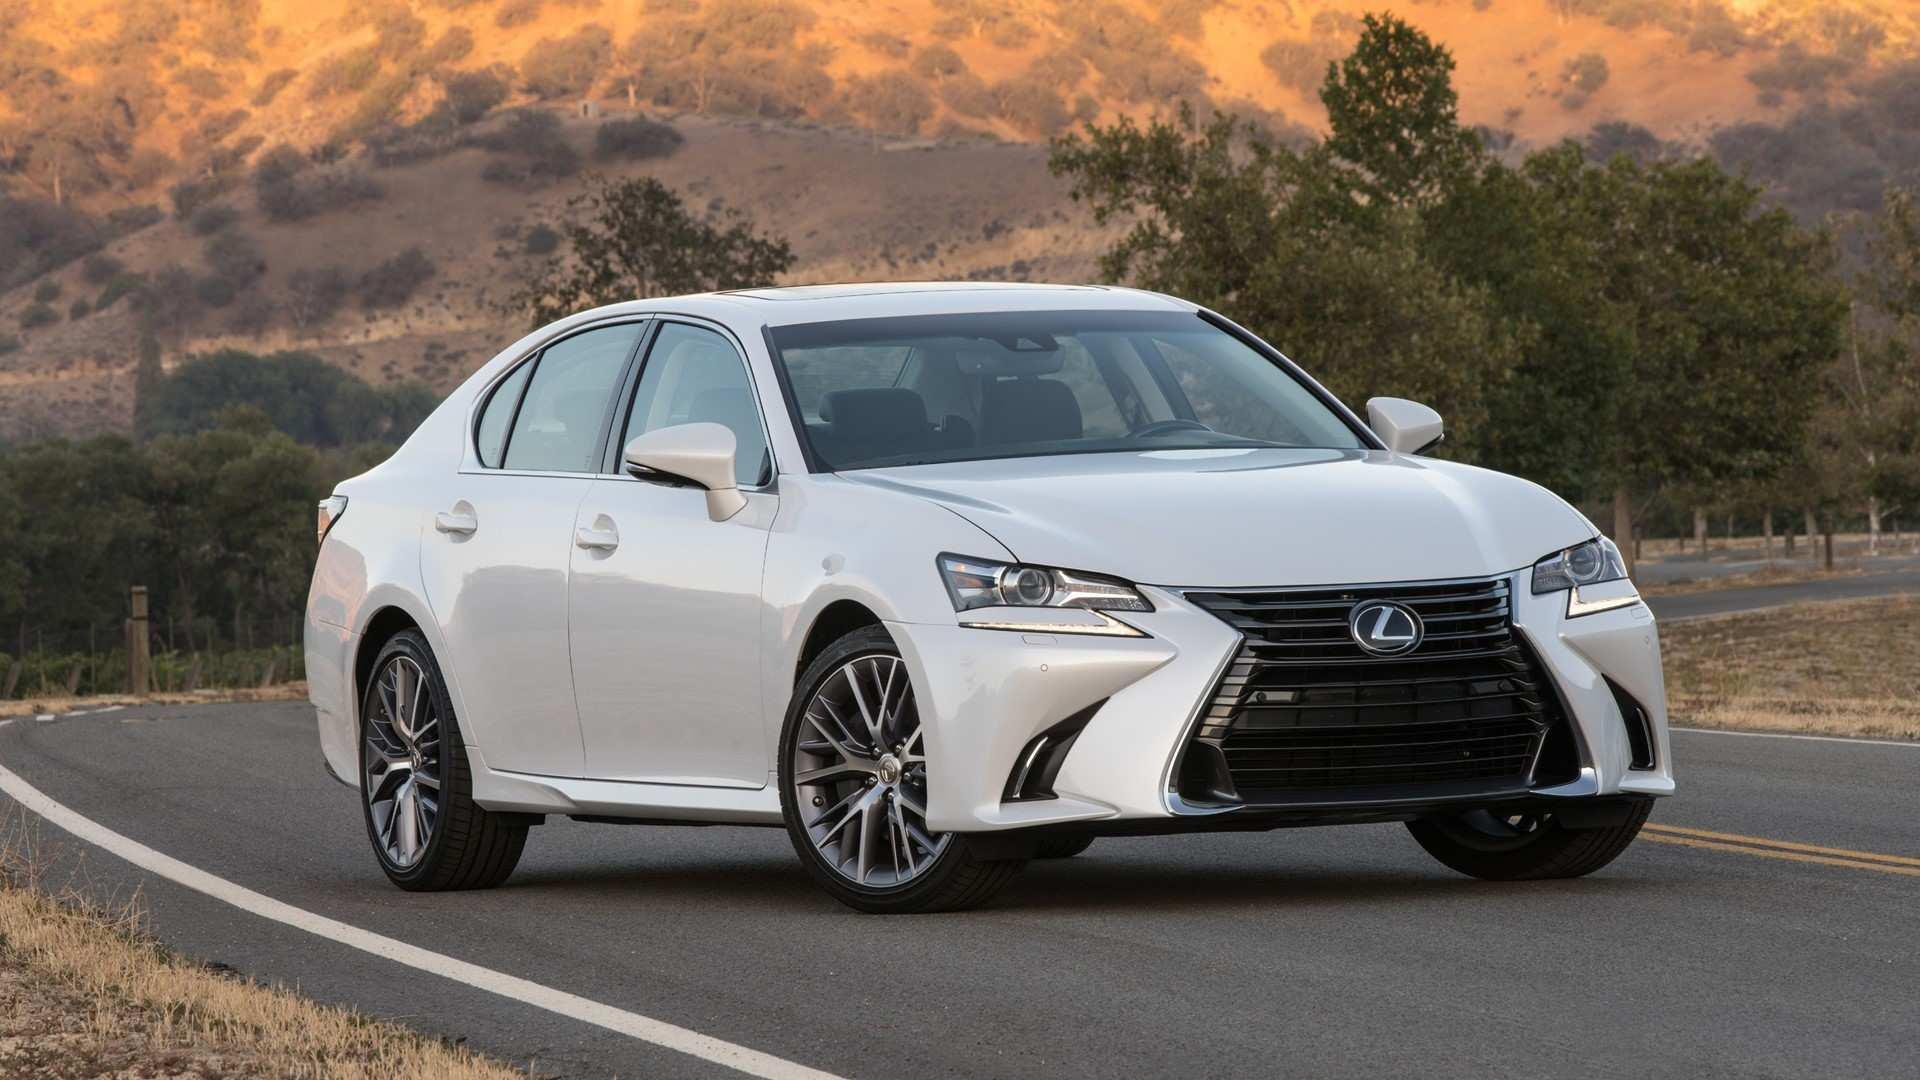 62 New Lexus Gs 2019 Ratings for Lexus Gs 2019